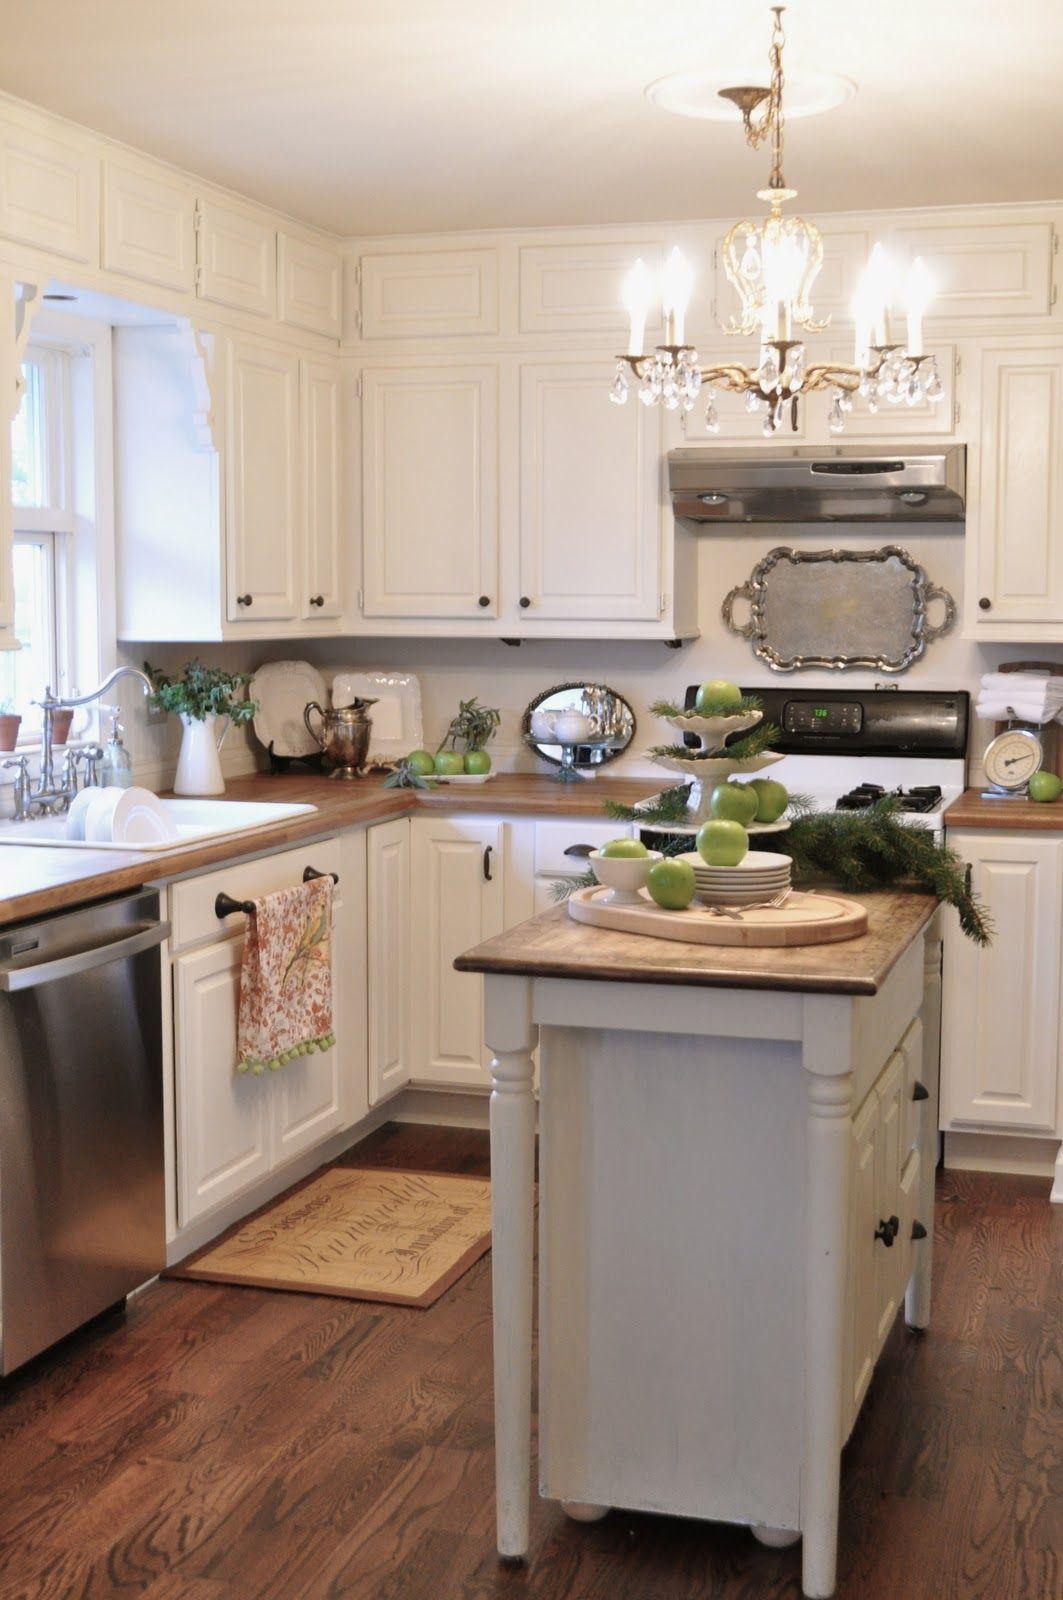 hello simple tasteful kitchen on a budget please insert yourself